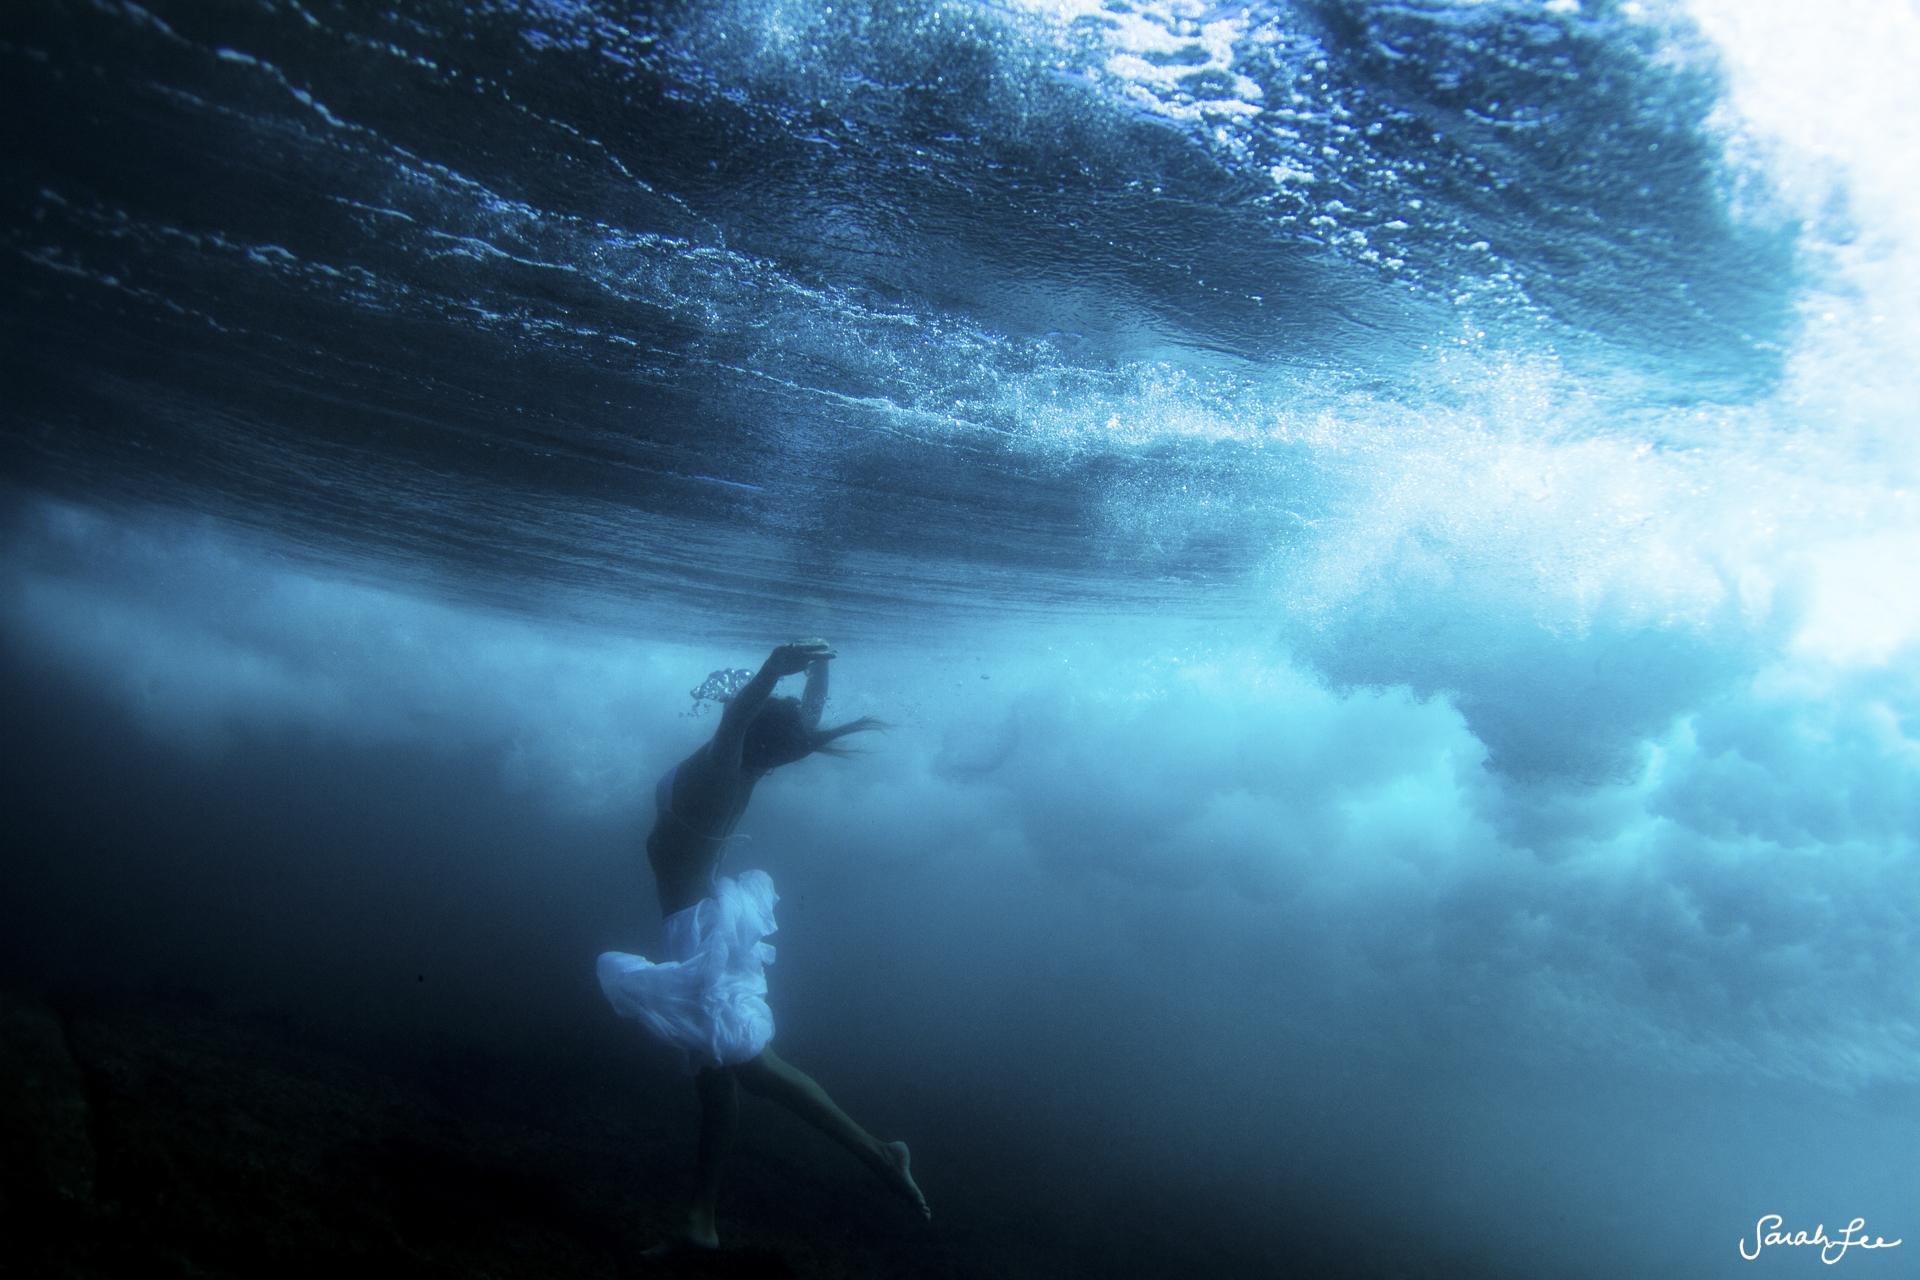 016_Sarah_Lee_Photography_Underwater_5848.jpg